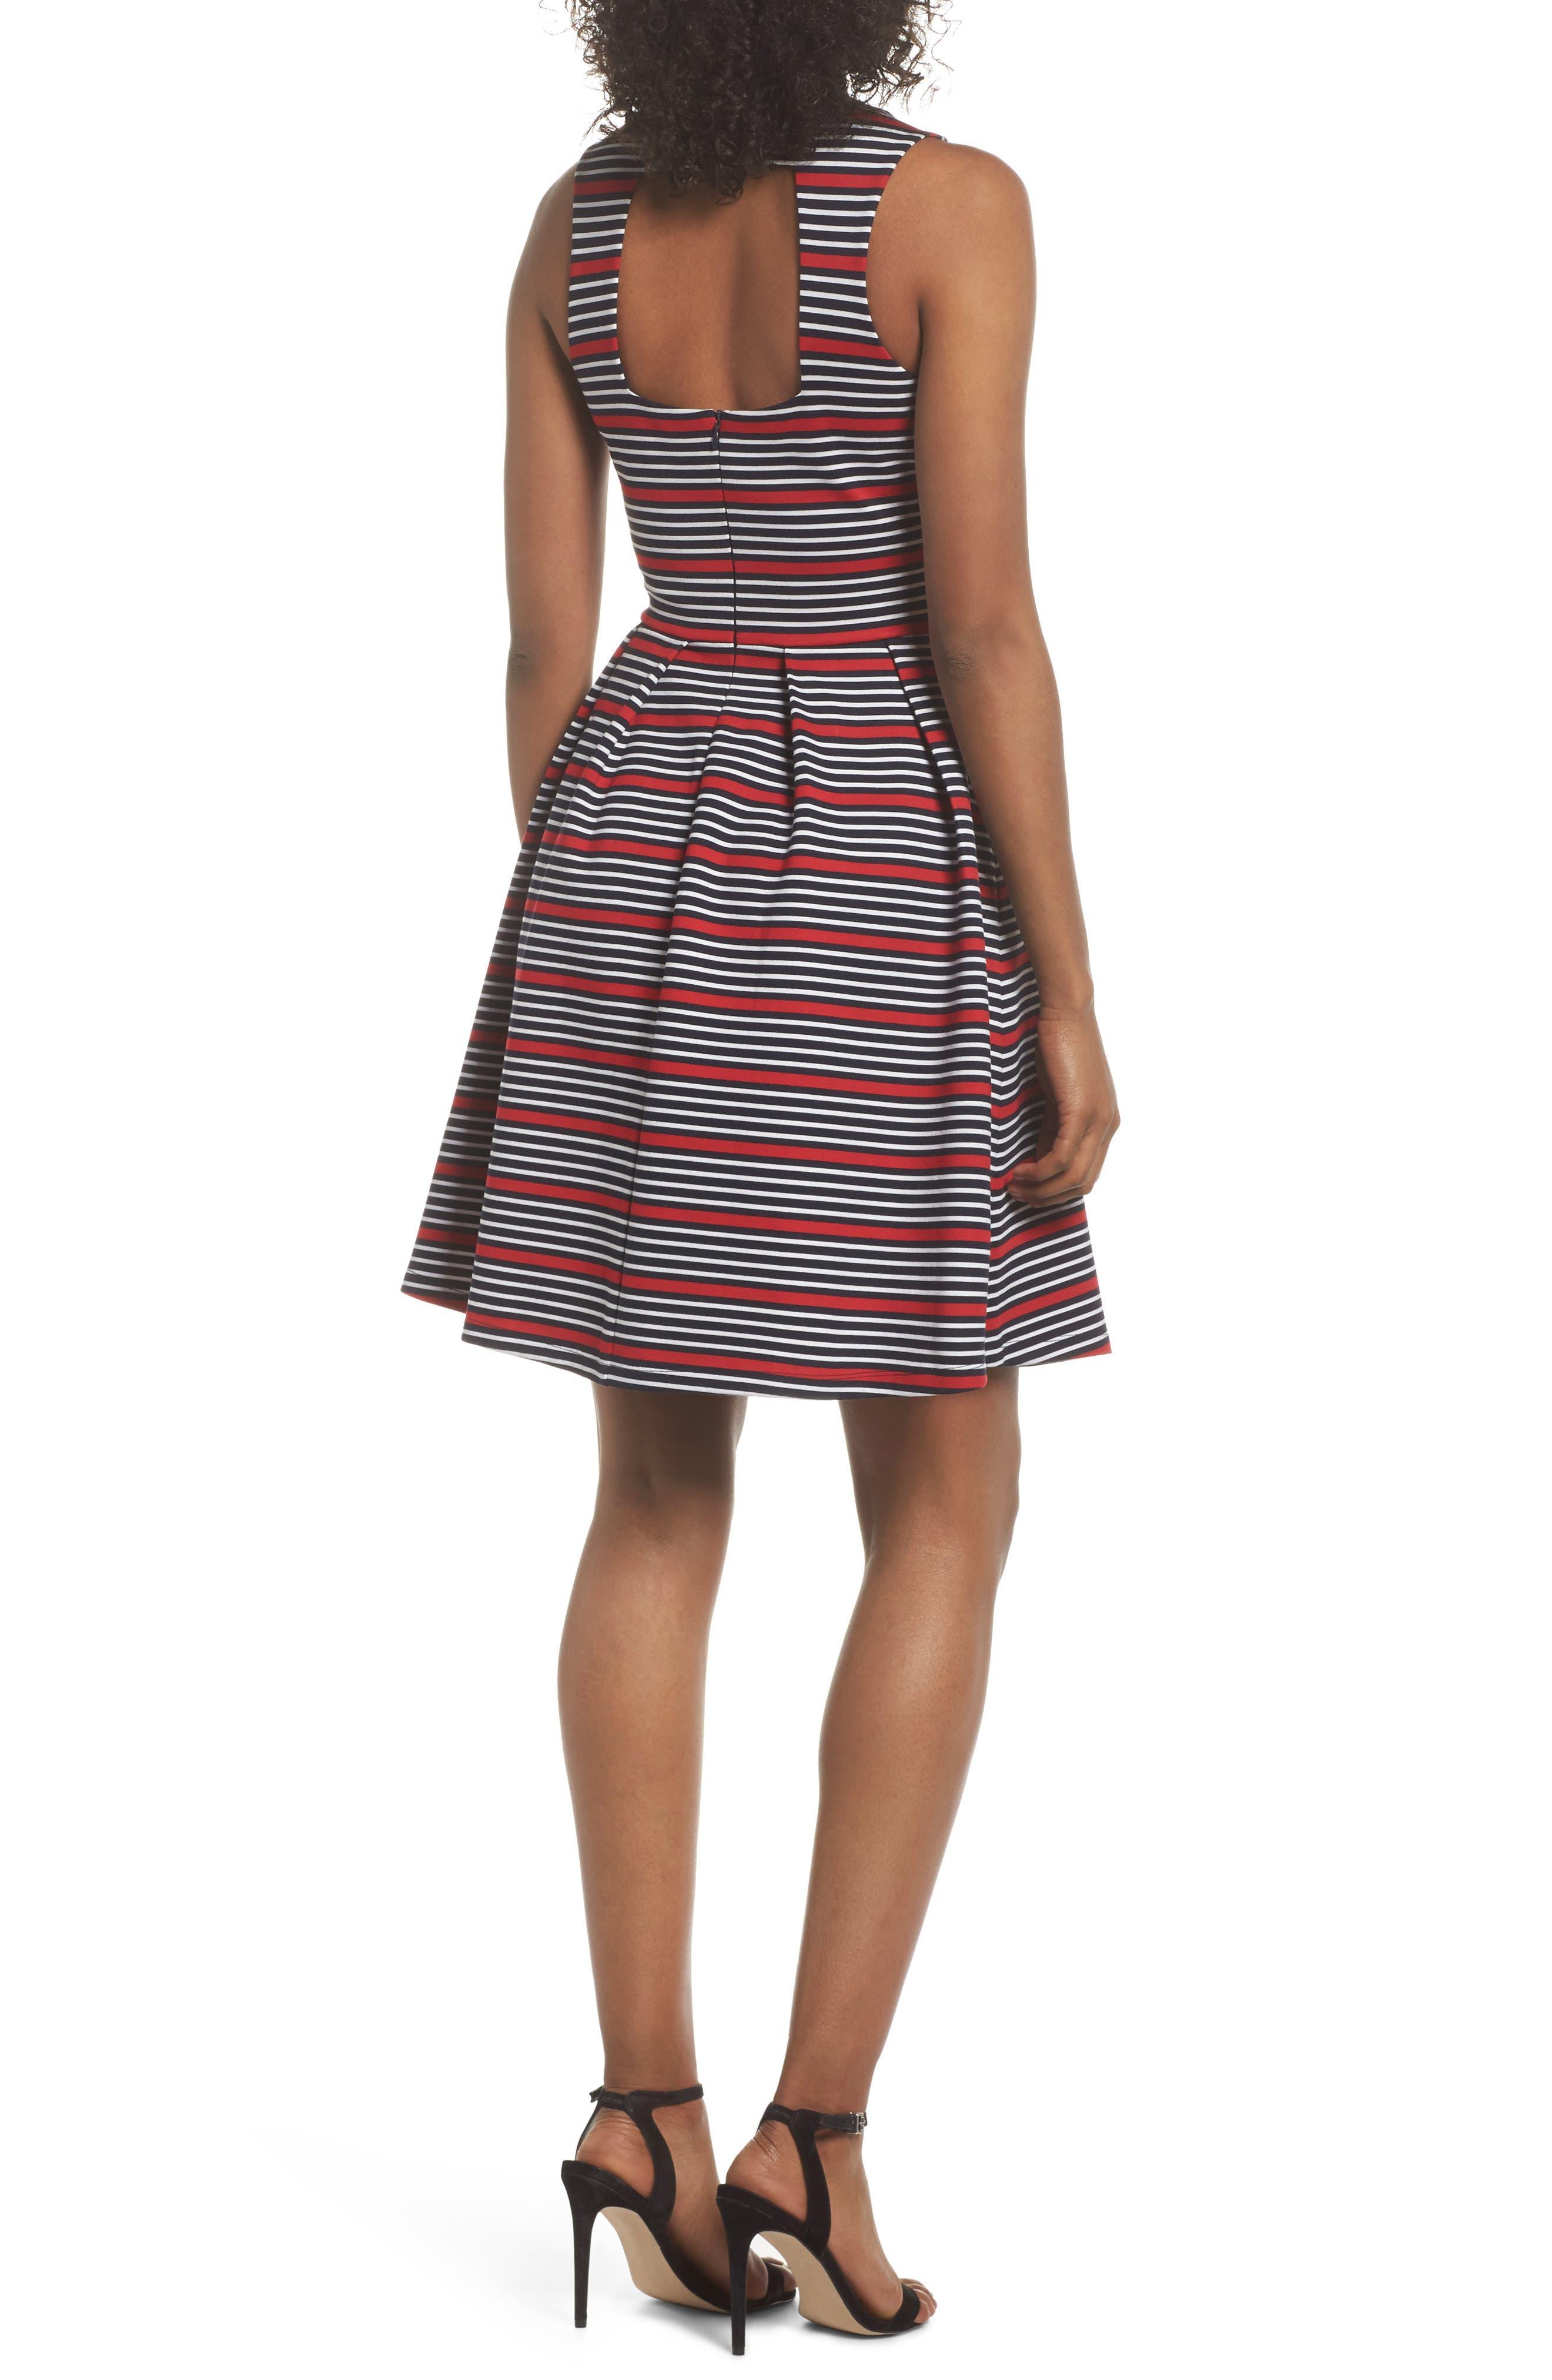 Scarlette Stripe Fit & Flare Dress,                             Alternate thumbnail 2, color,                             Navy/ Red/ White Stripe